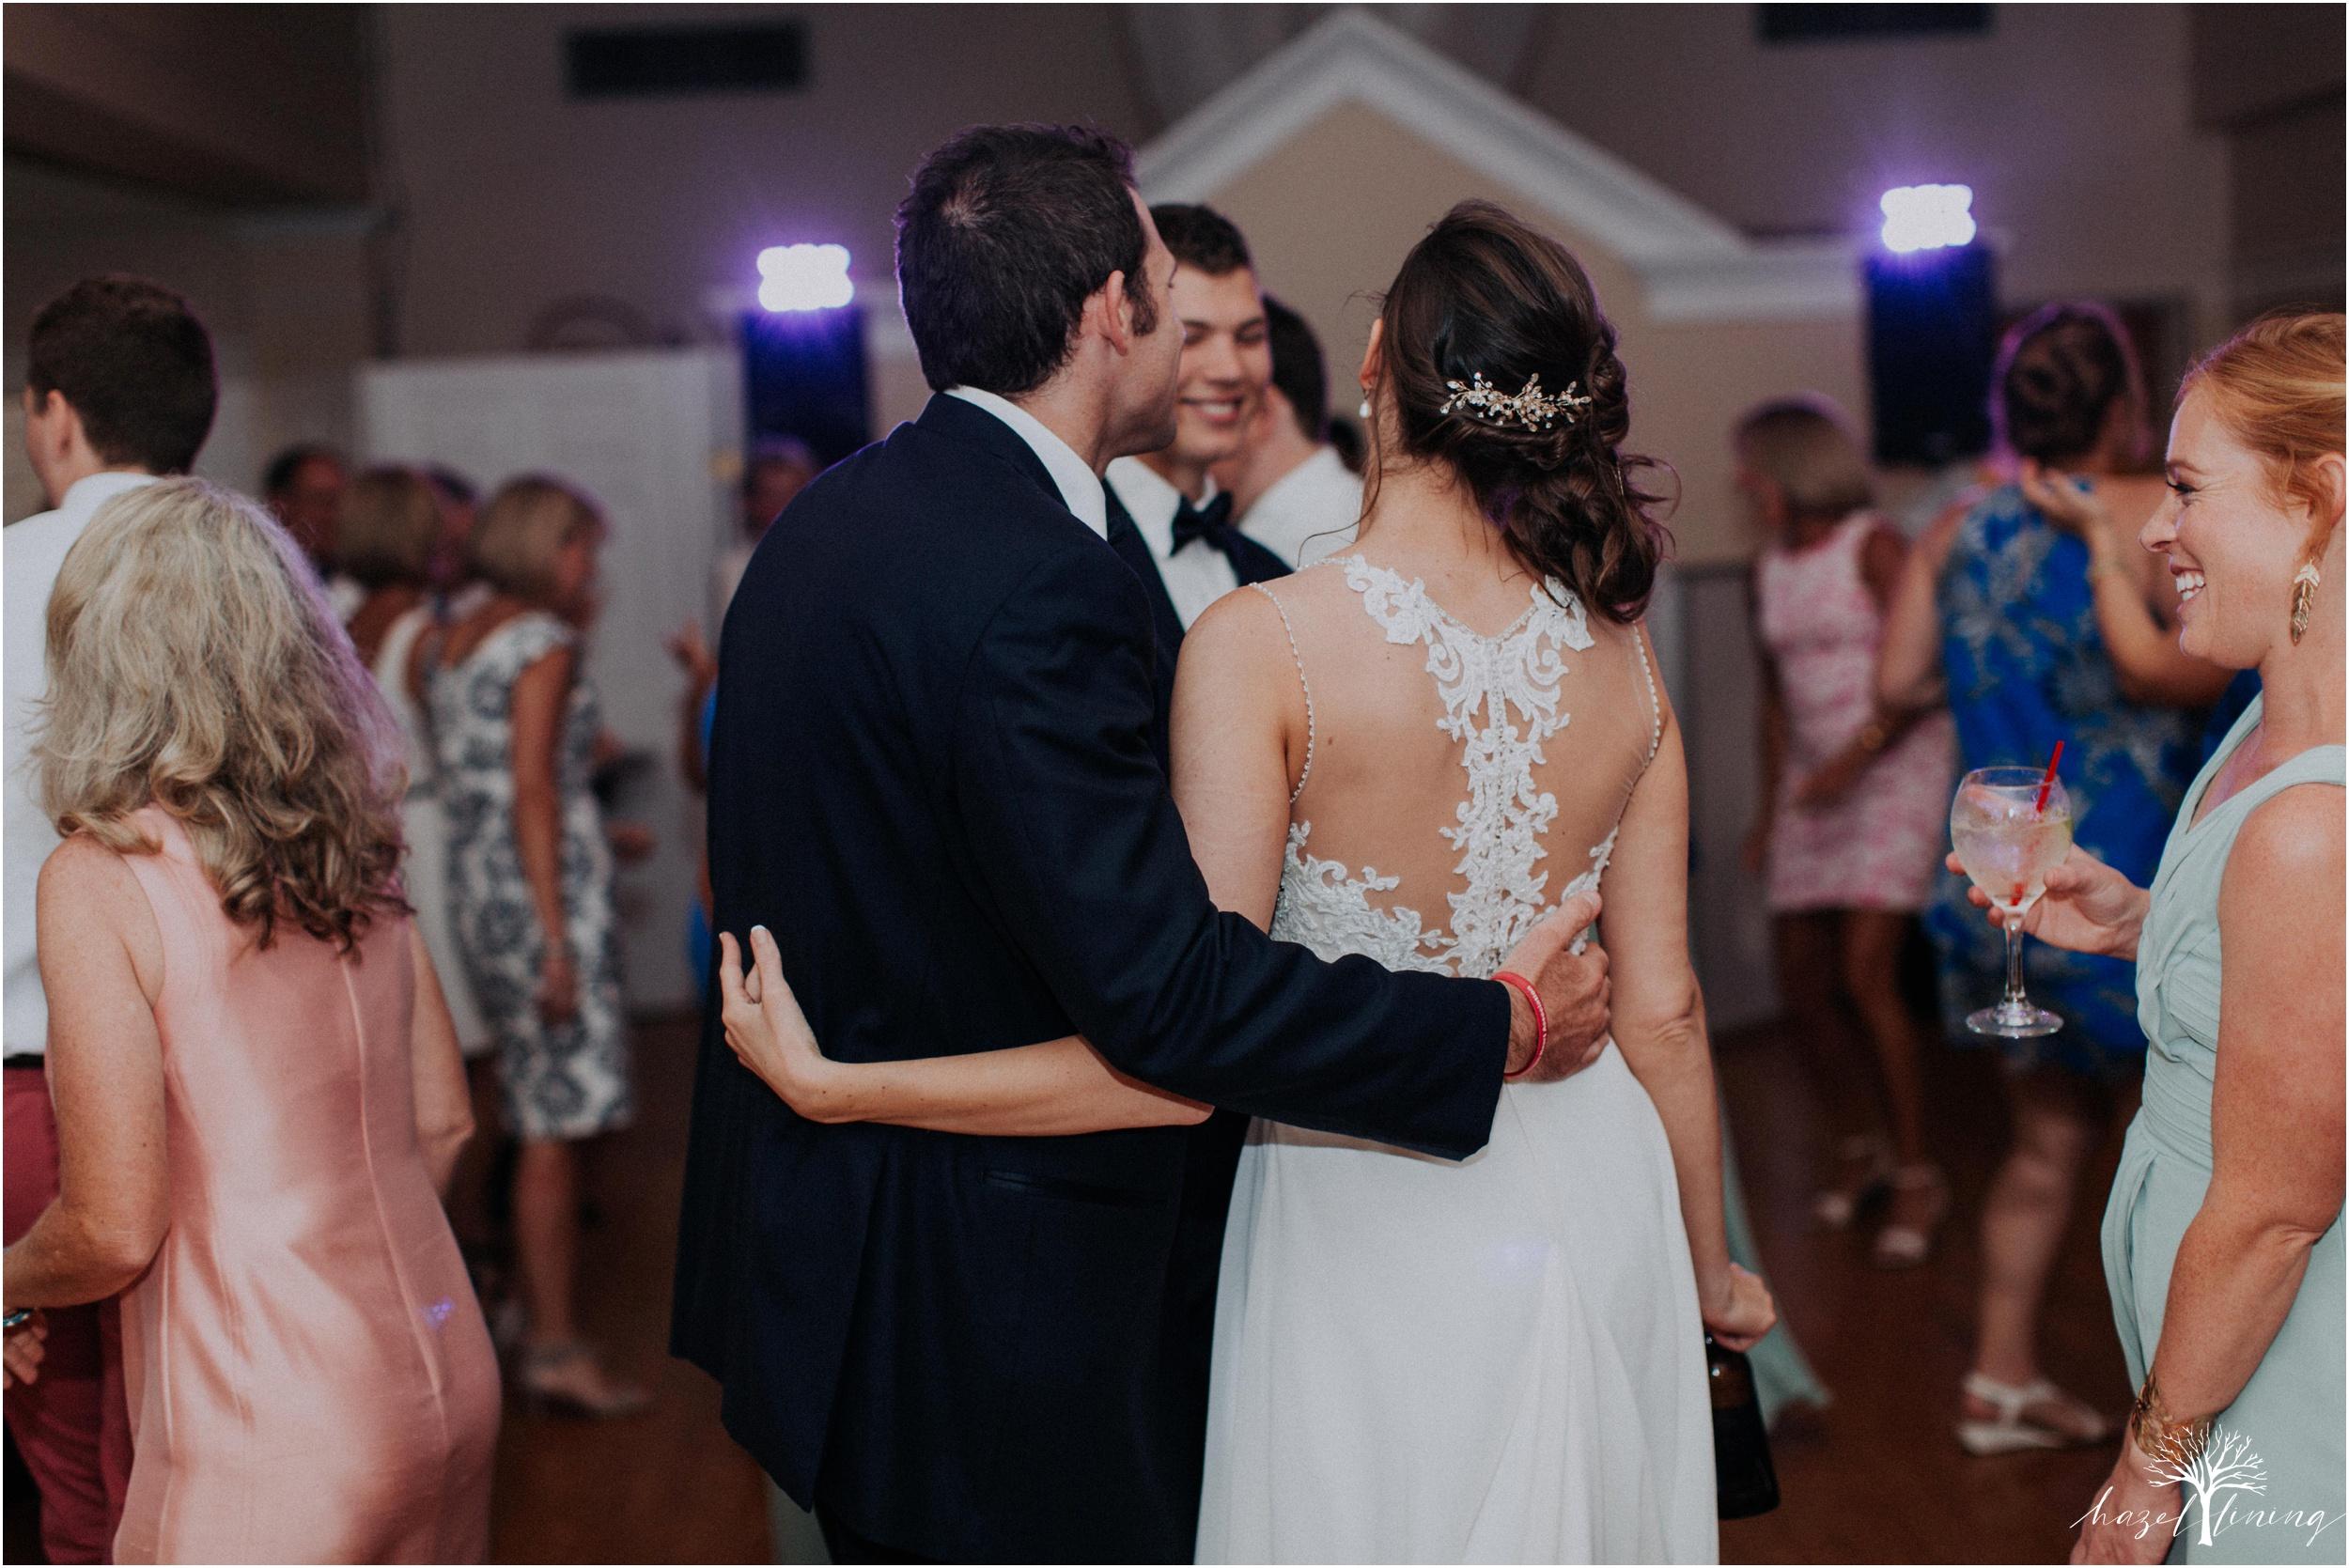 hazel-lining-travel-wedding-elopement-photography_0154.jpg